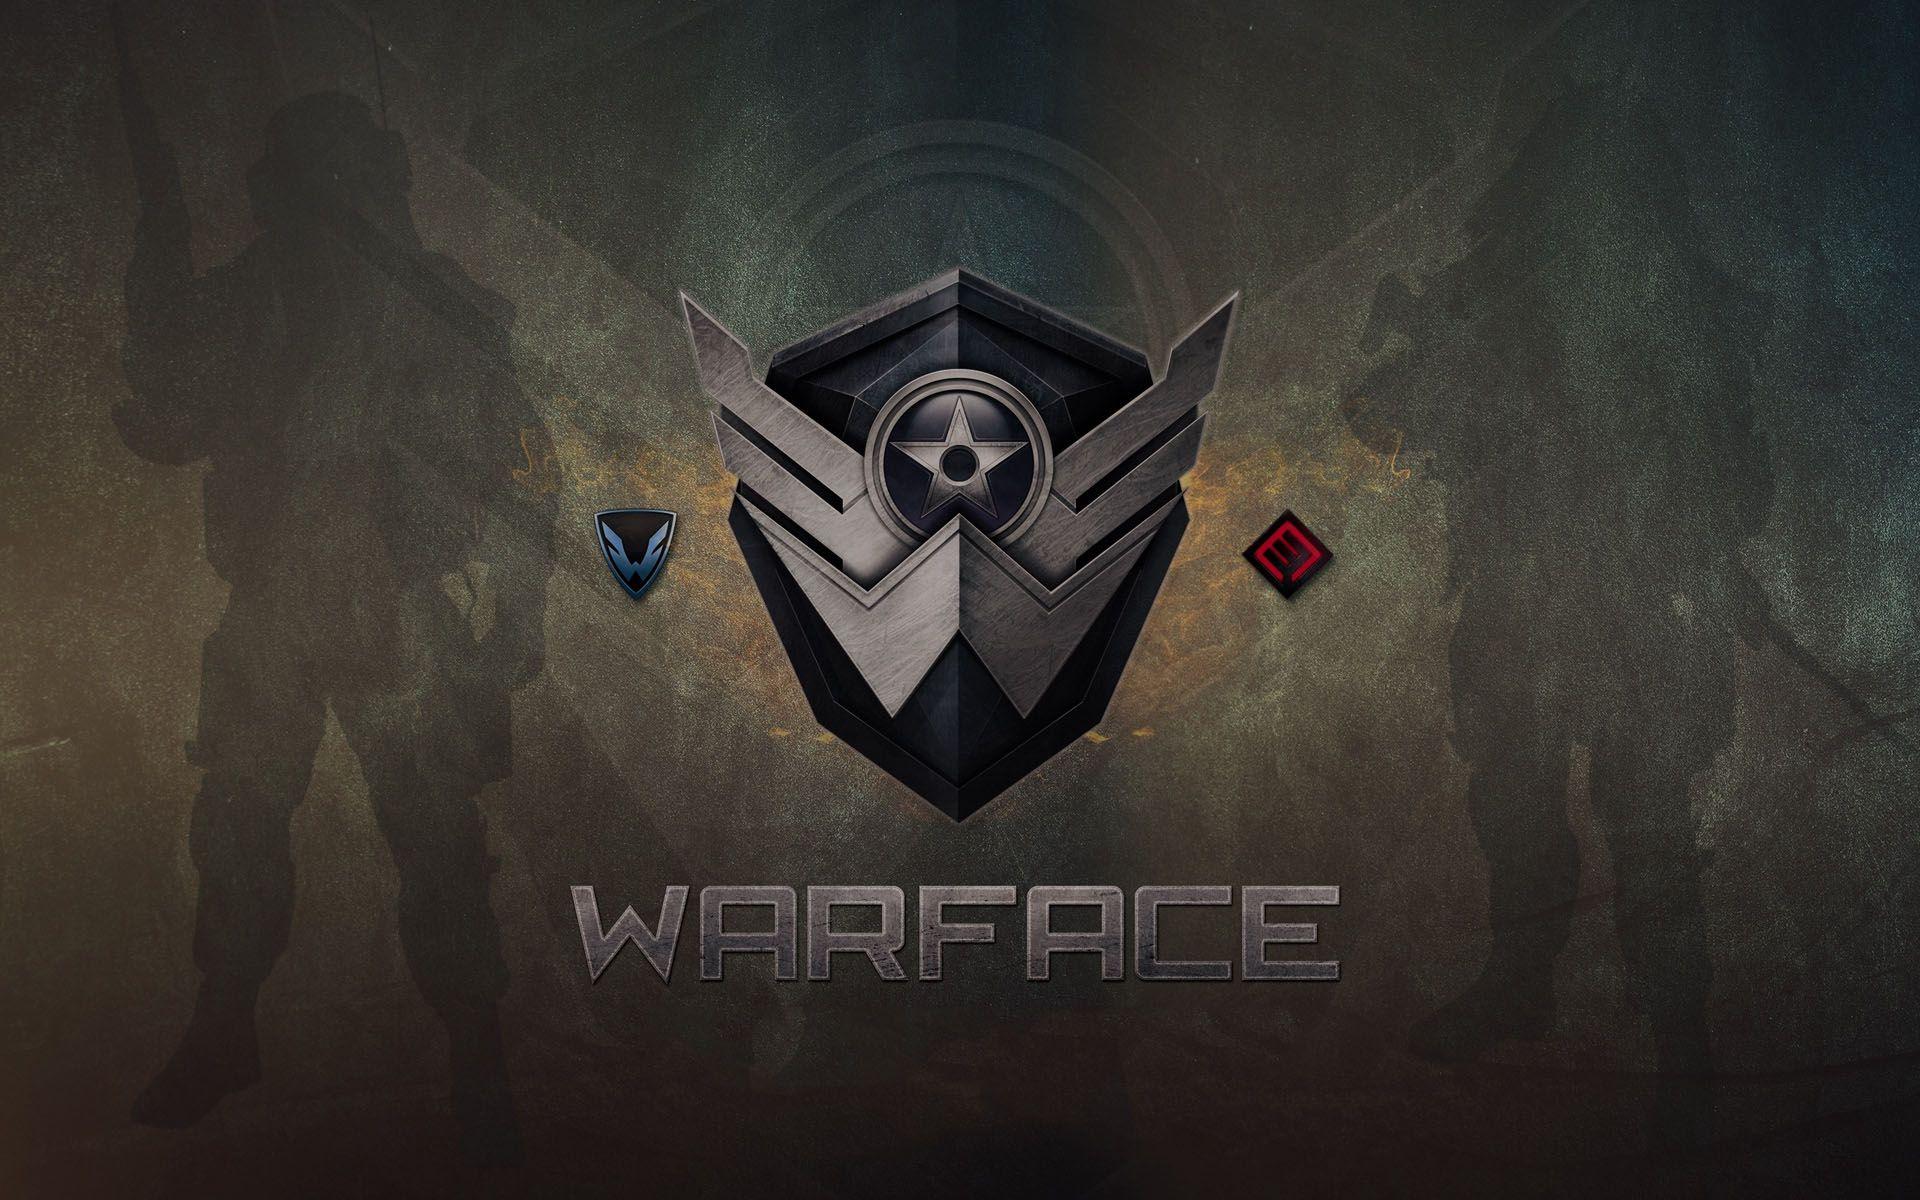 Warface hack HD wallpaper in 2019 Wallpaper, Games, Game